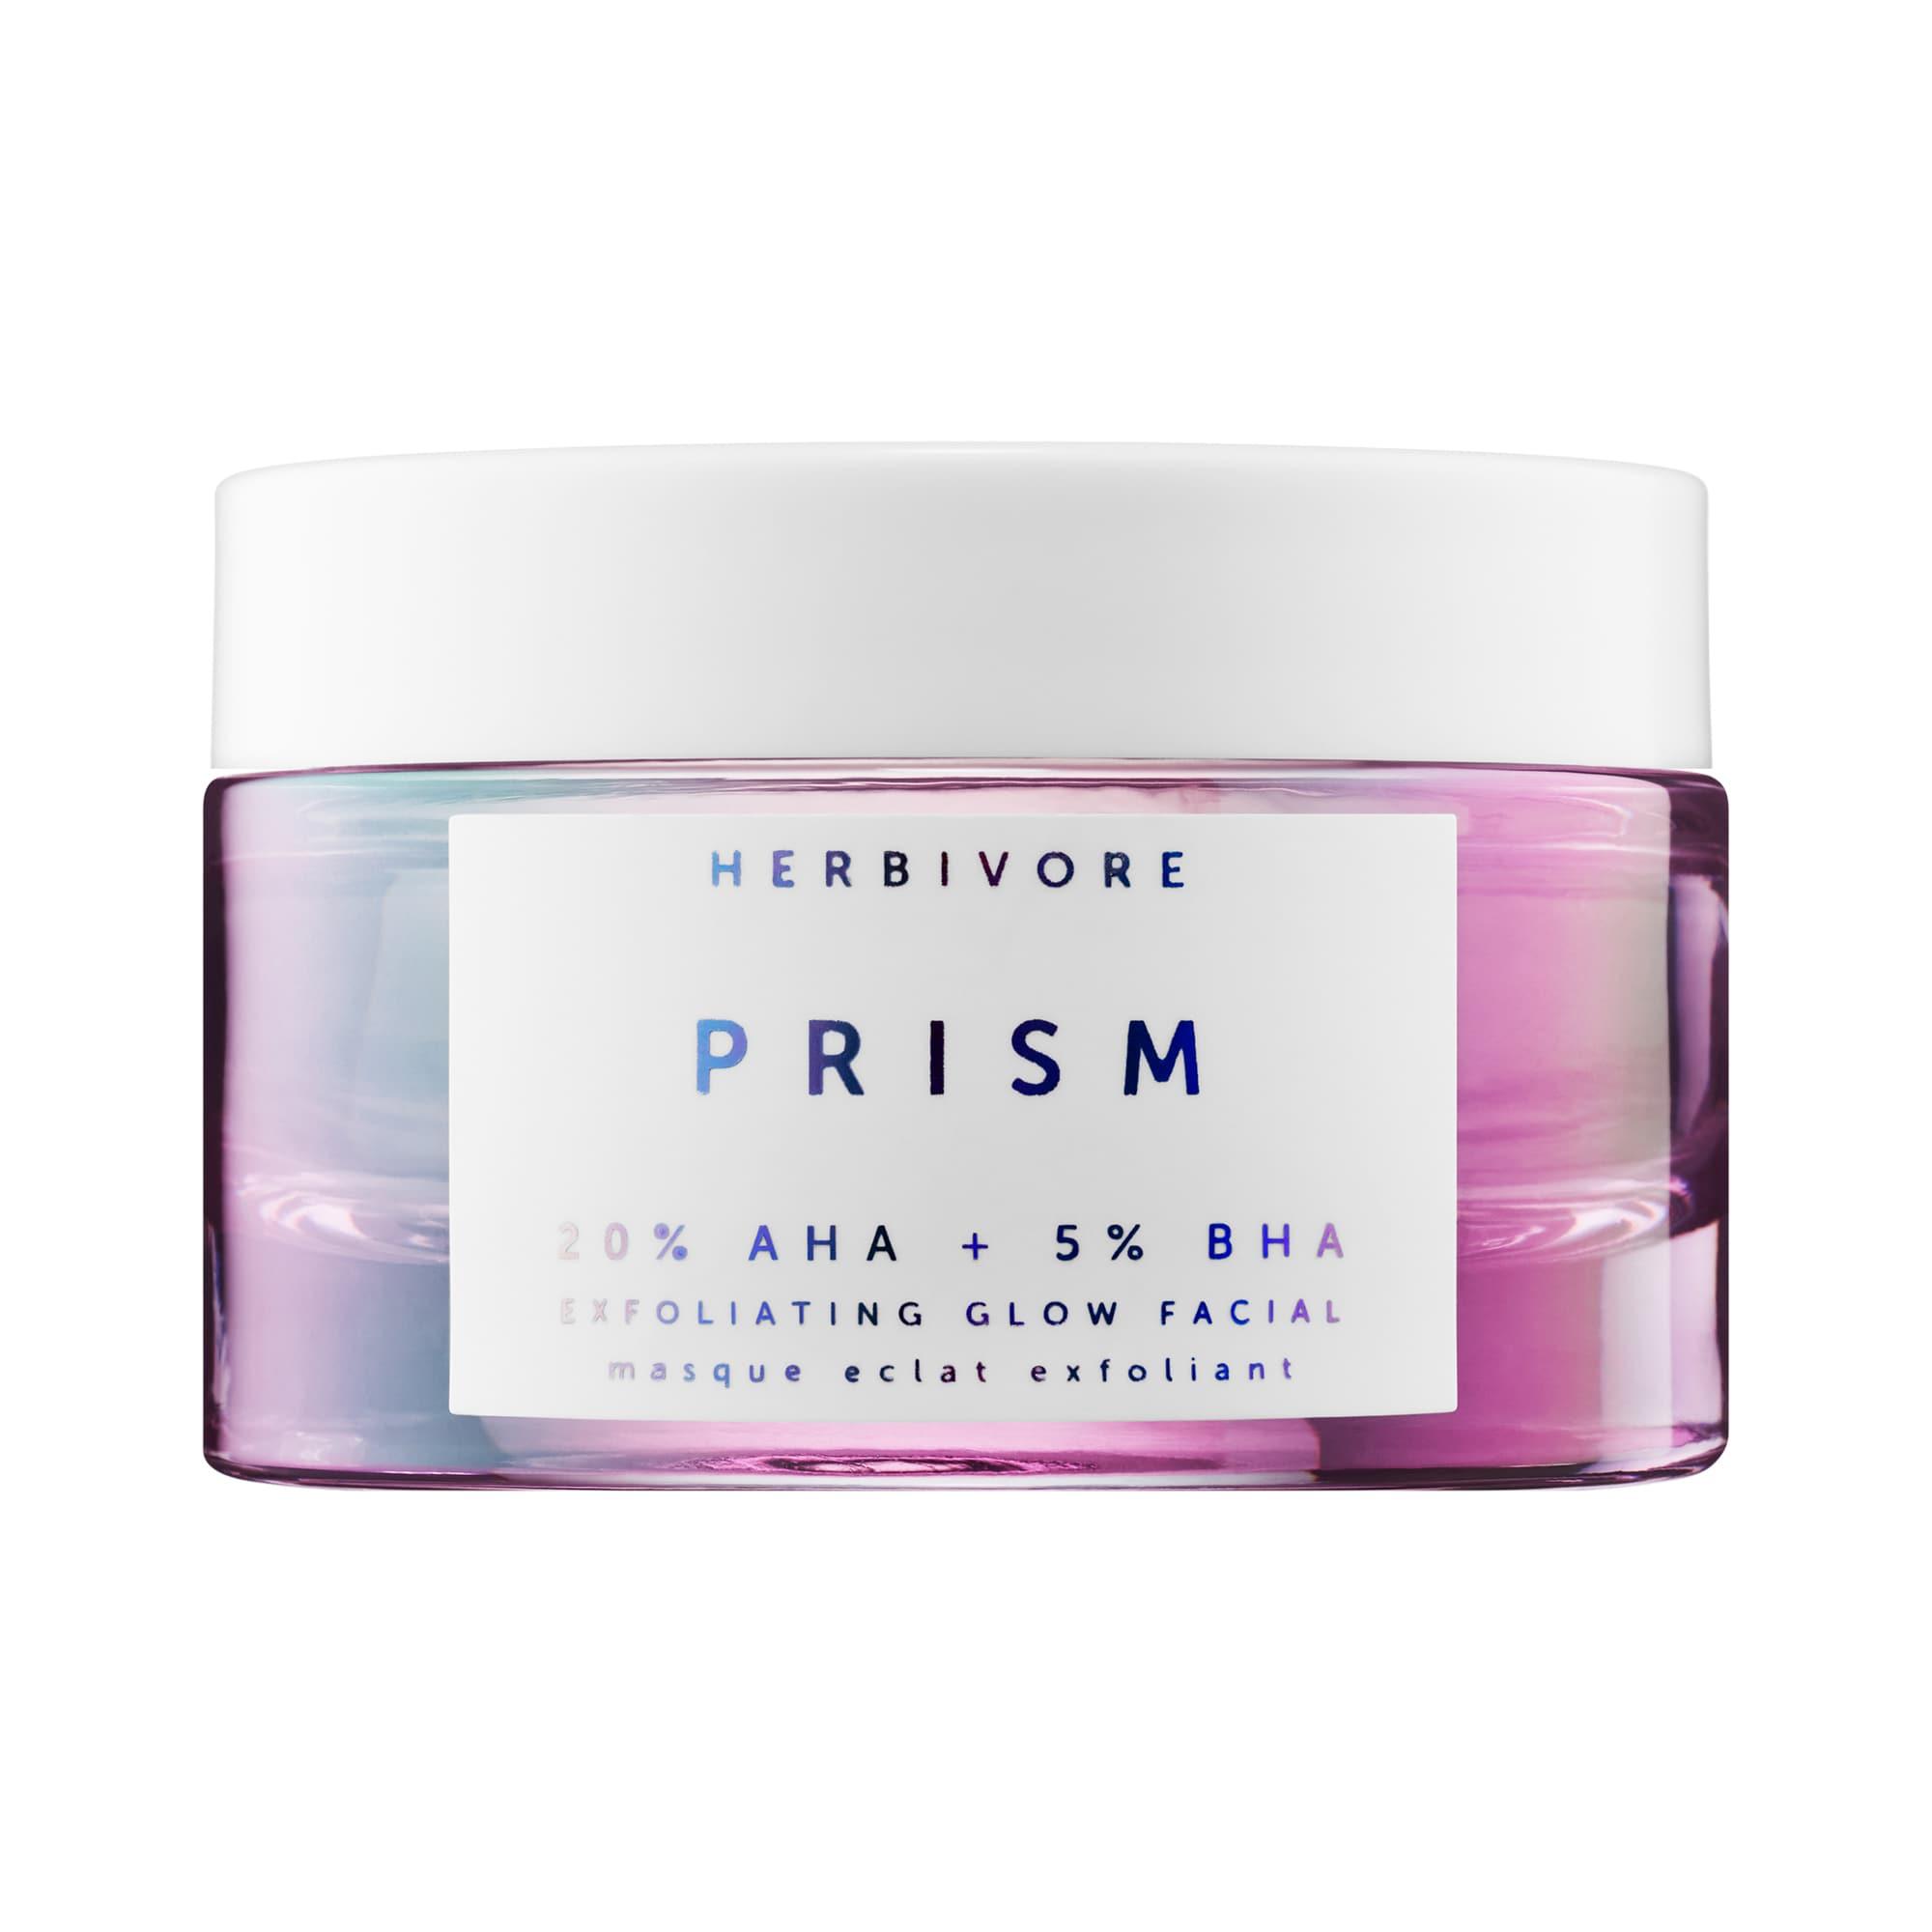 Herbivore - Prism 20% AHA + 5% BHA Exfoliating Glow Facial